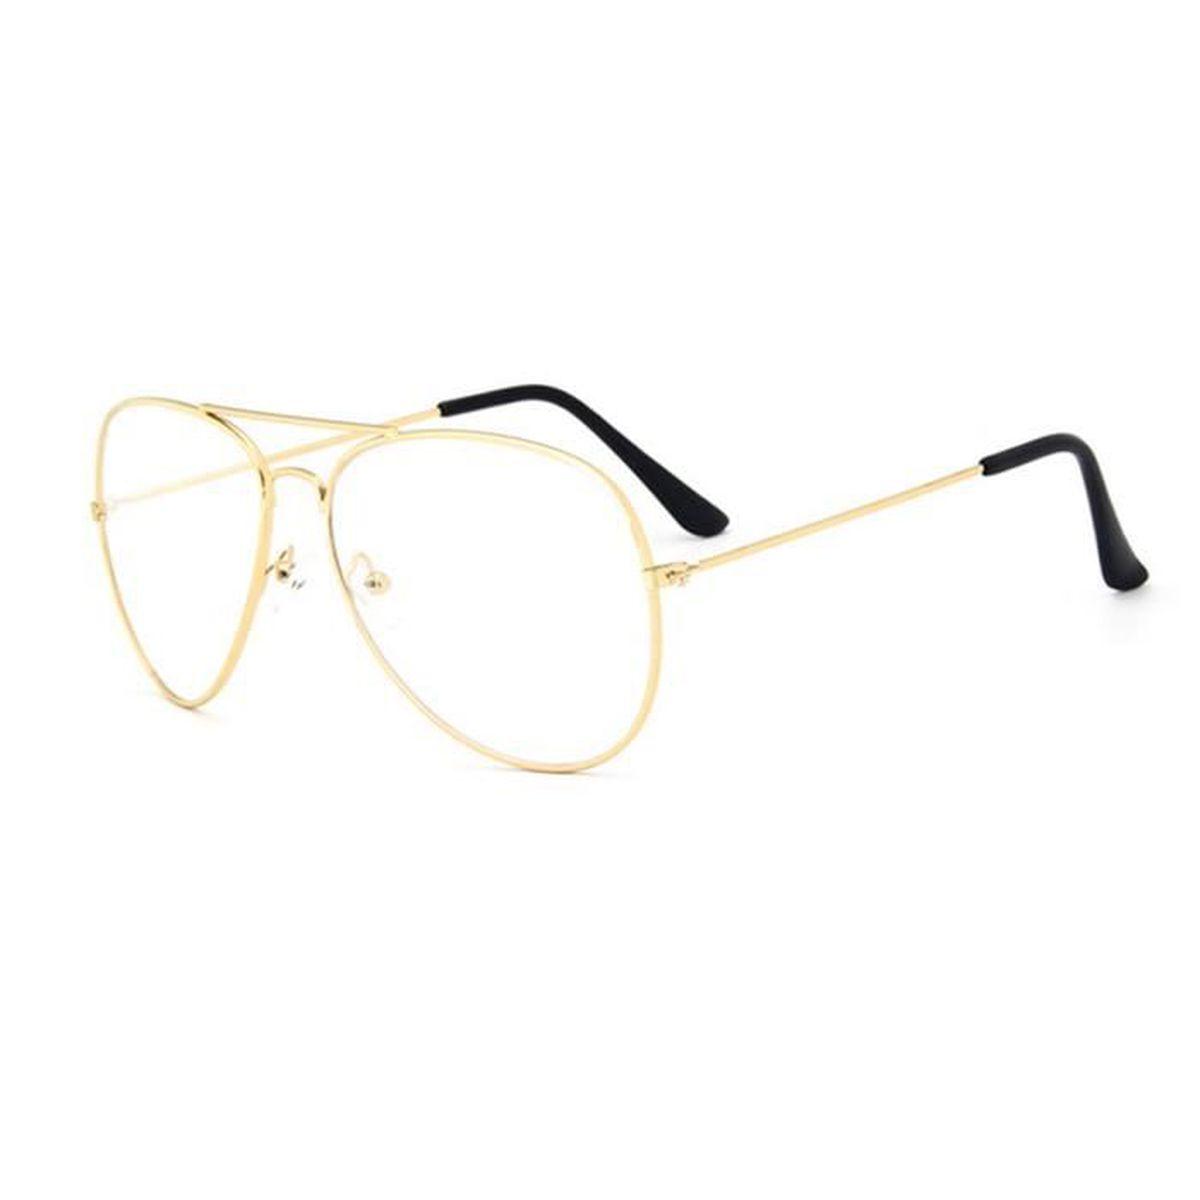 monture lunette de vue pilote loupe l ger myopie presbyte optique elev femme or achat vente. Black Bedroom Furniture Sets. Home Design Ideas